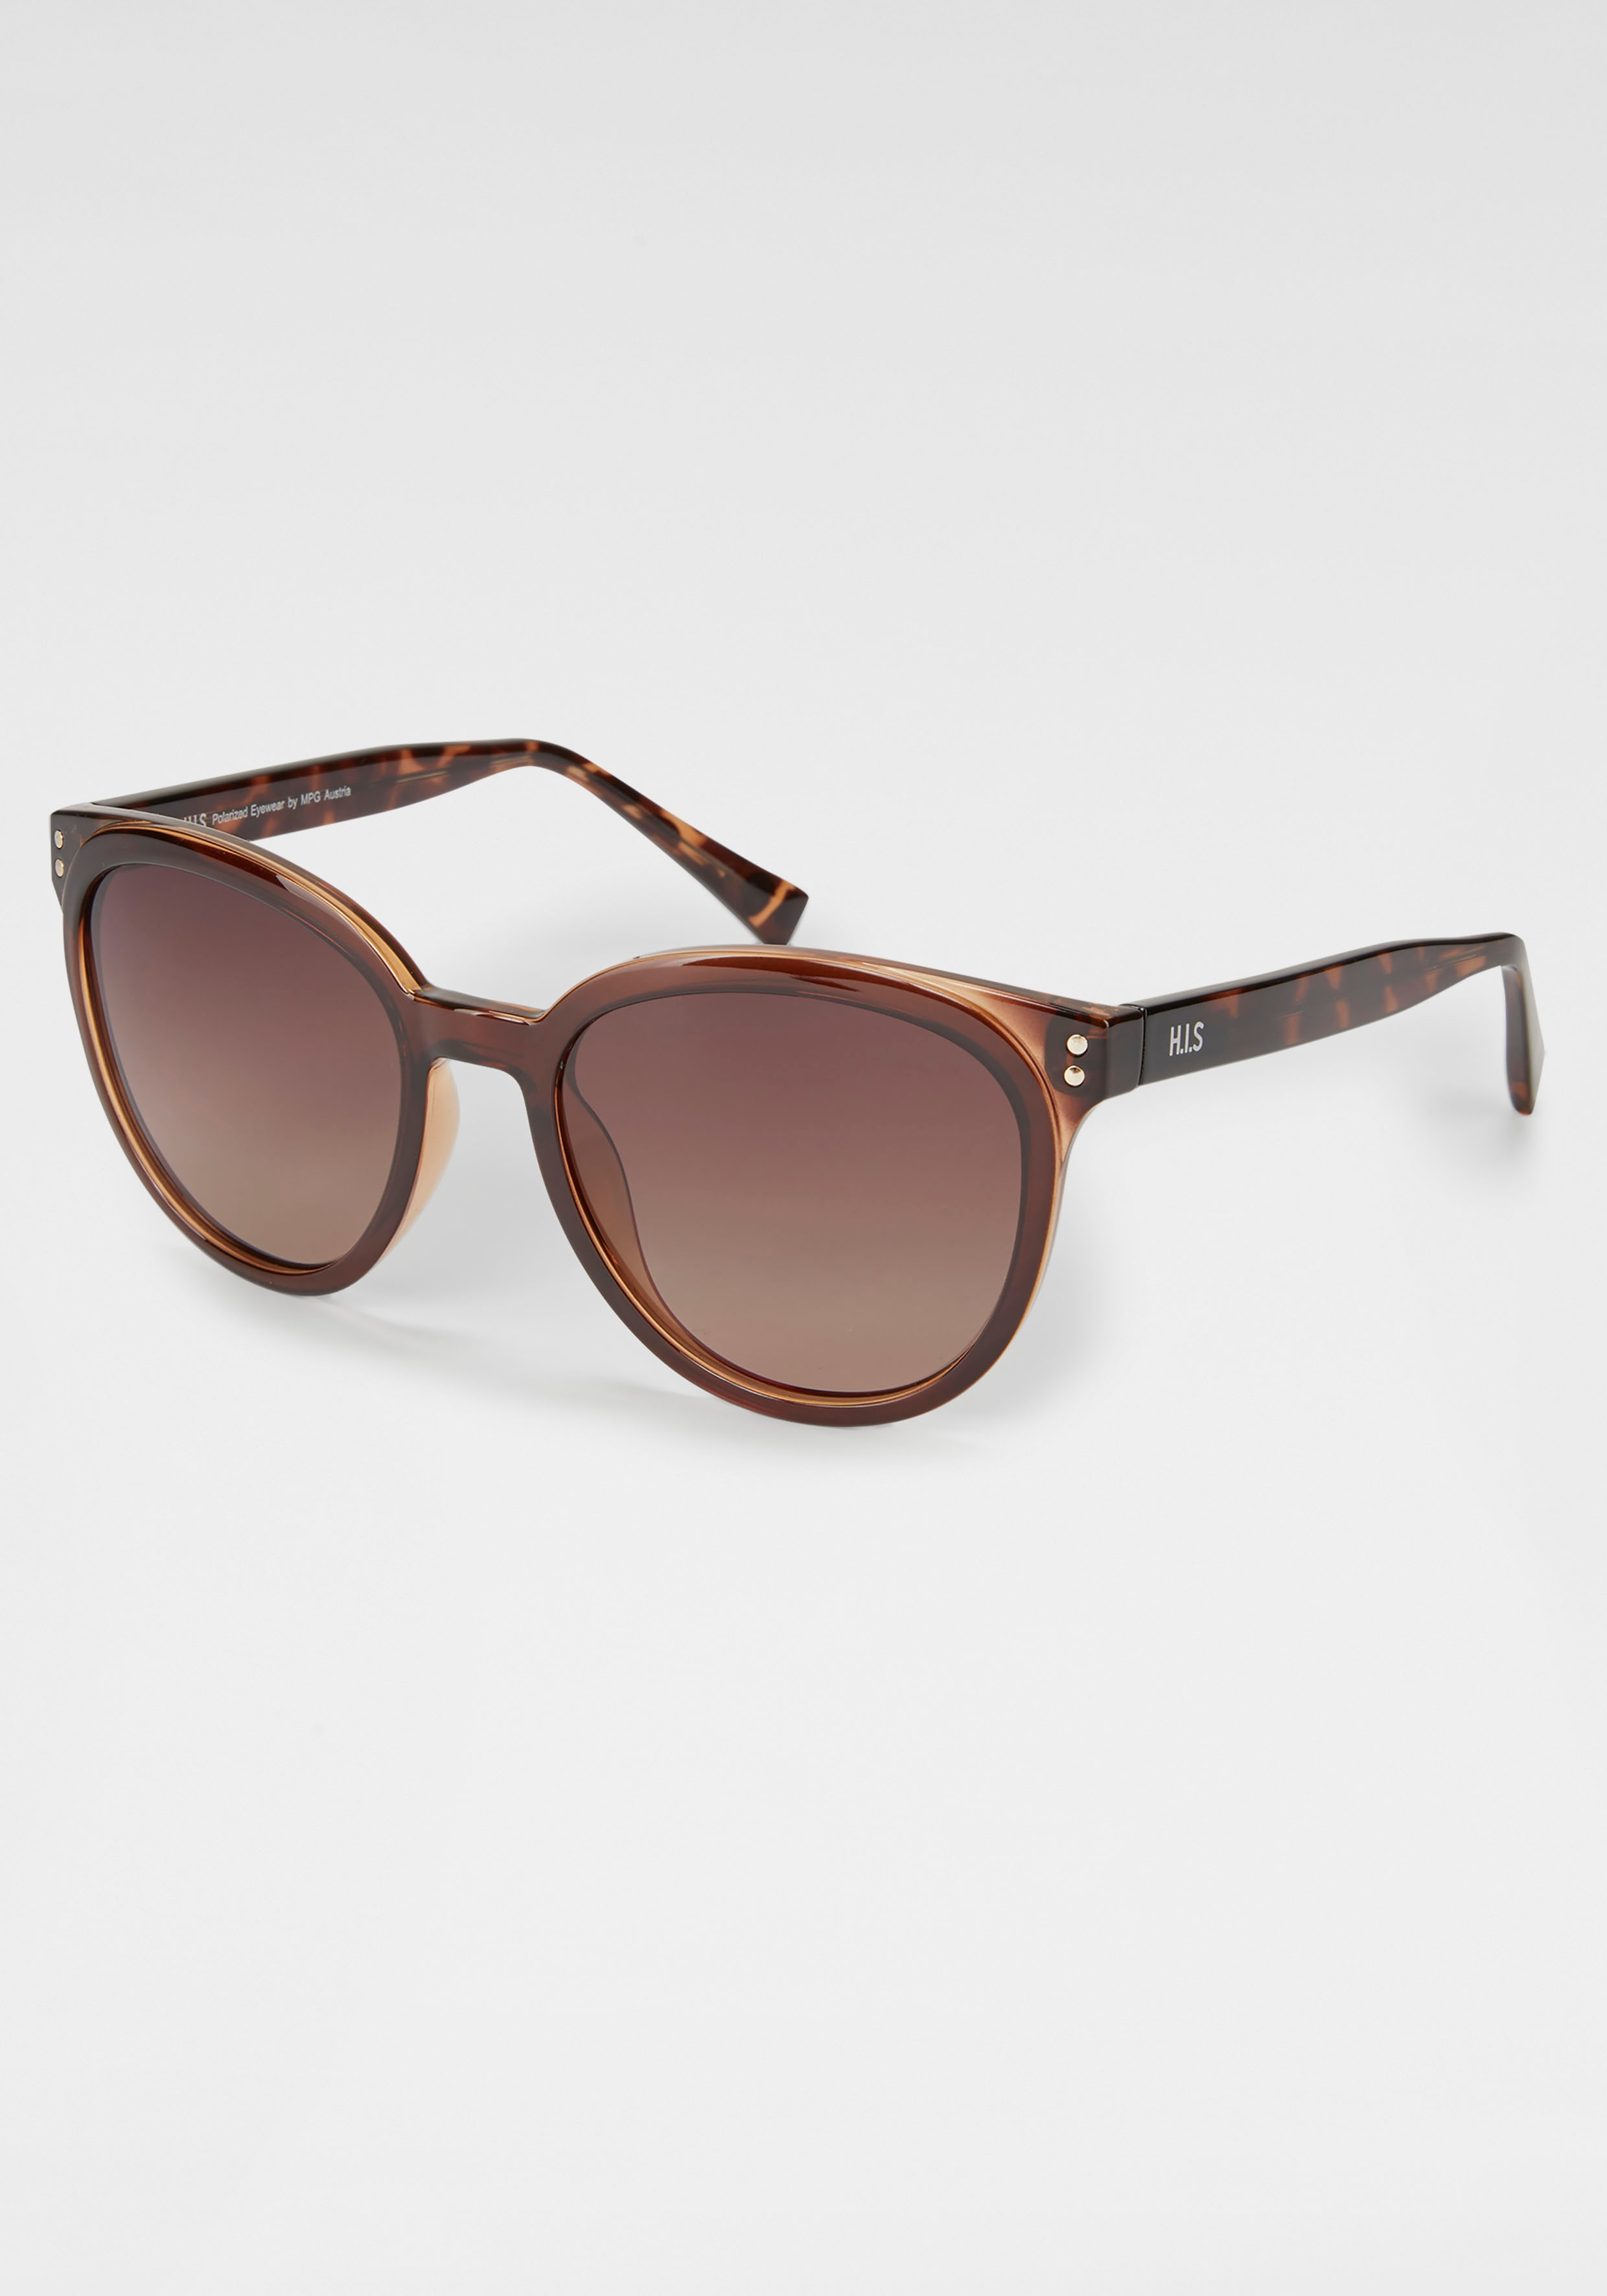 HIS Eyewear Sonnenbrille | Accessoires > Sonnenbrillen > Sonstige Sonnenbrillen | His Eyewear